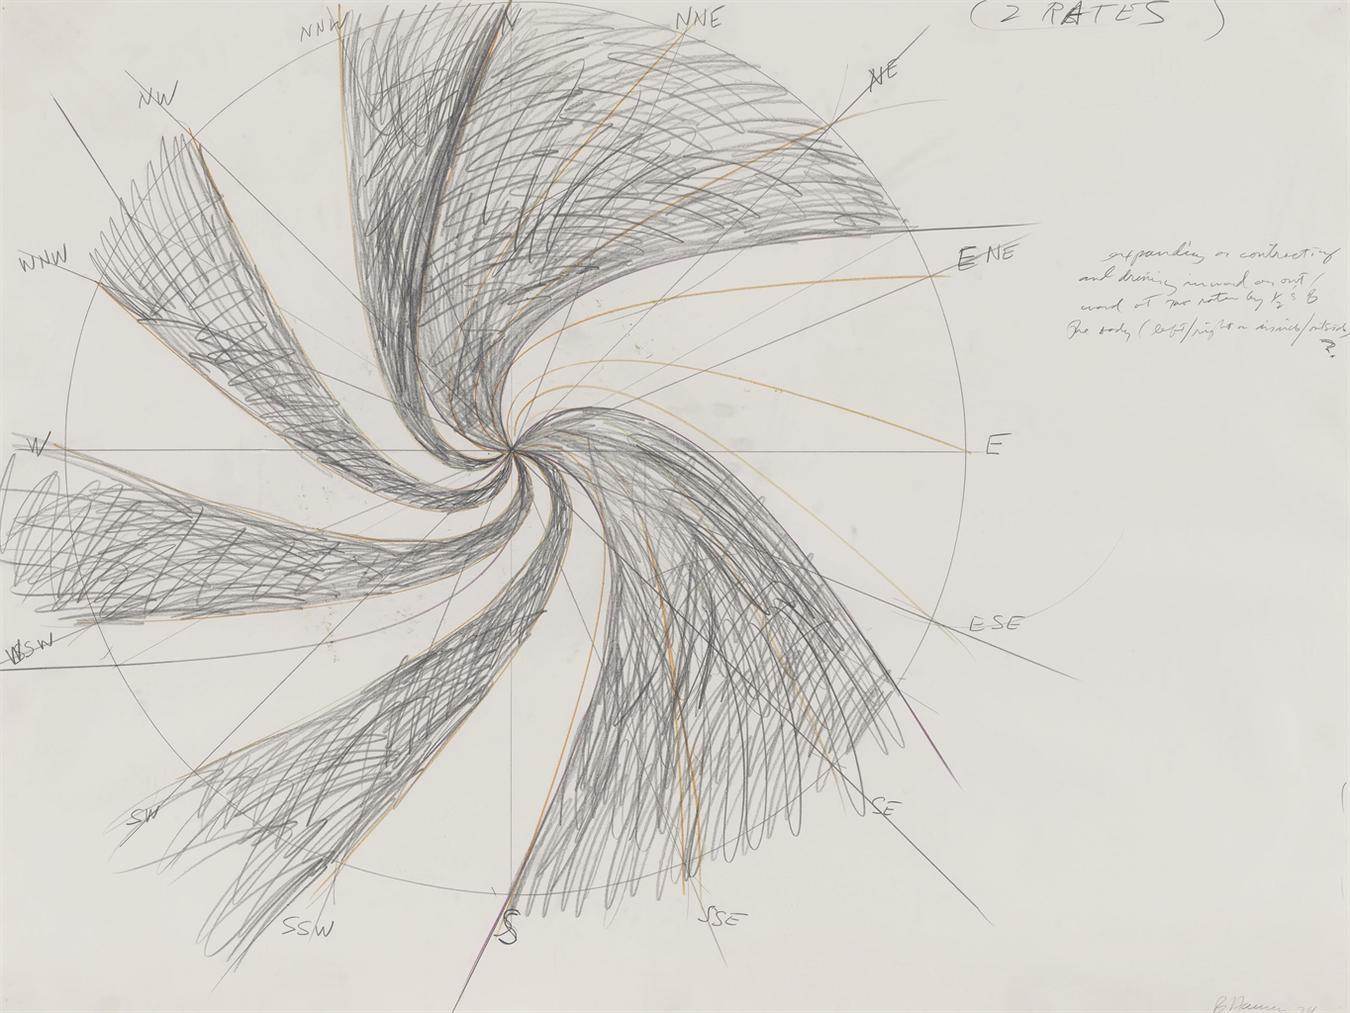 Bruce Nauman-Untitled (2 Rates)-1974